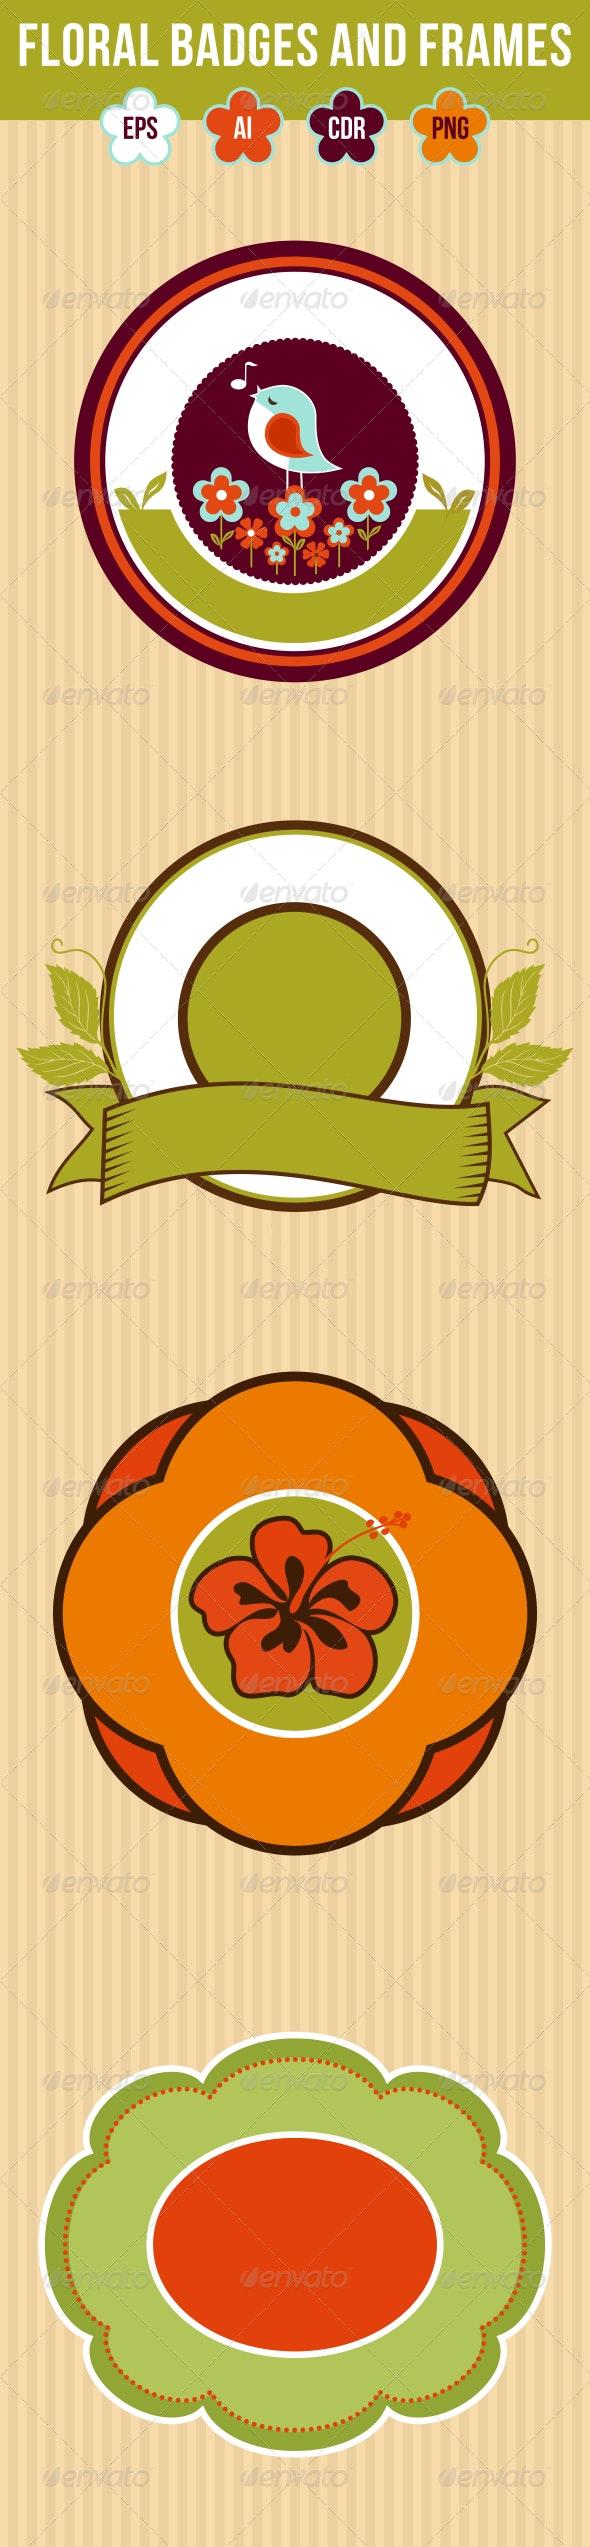 4 Floral Badges and Frames - Miscellaneous Conceptual